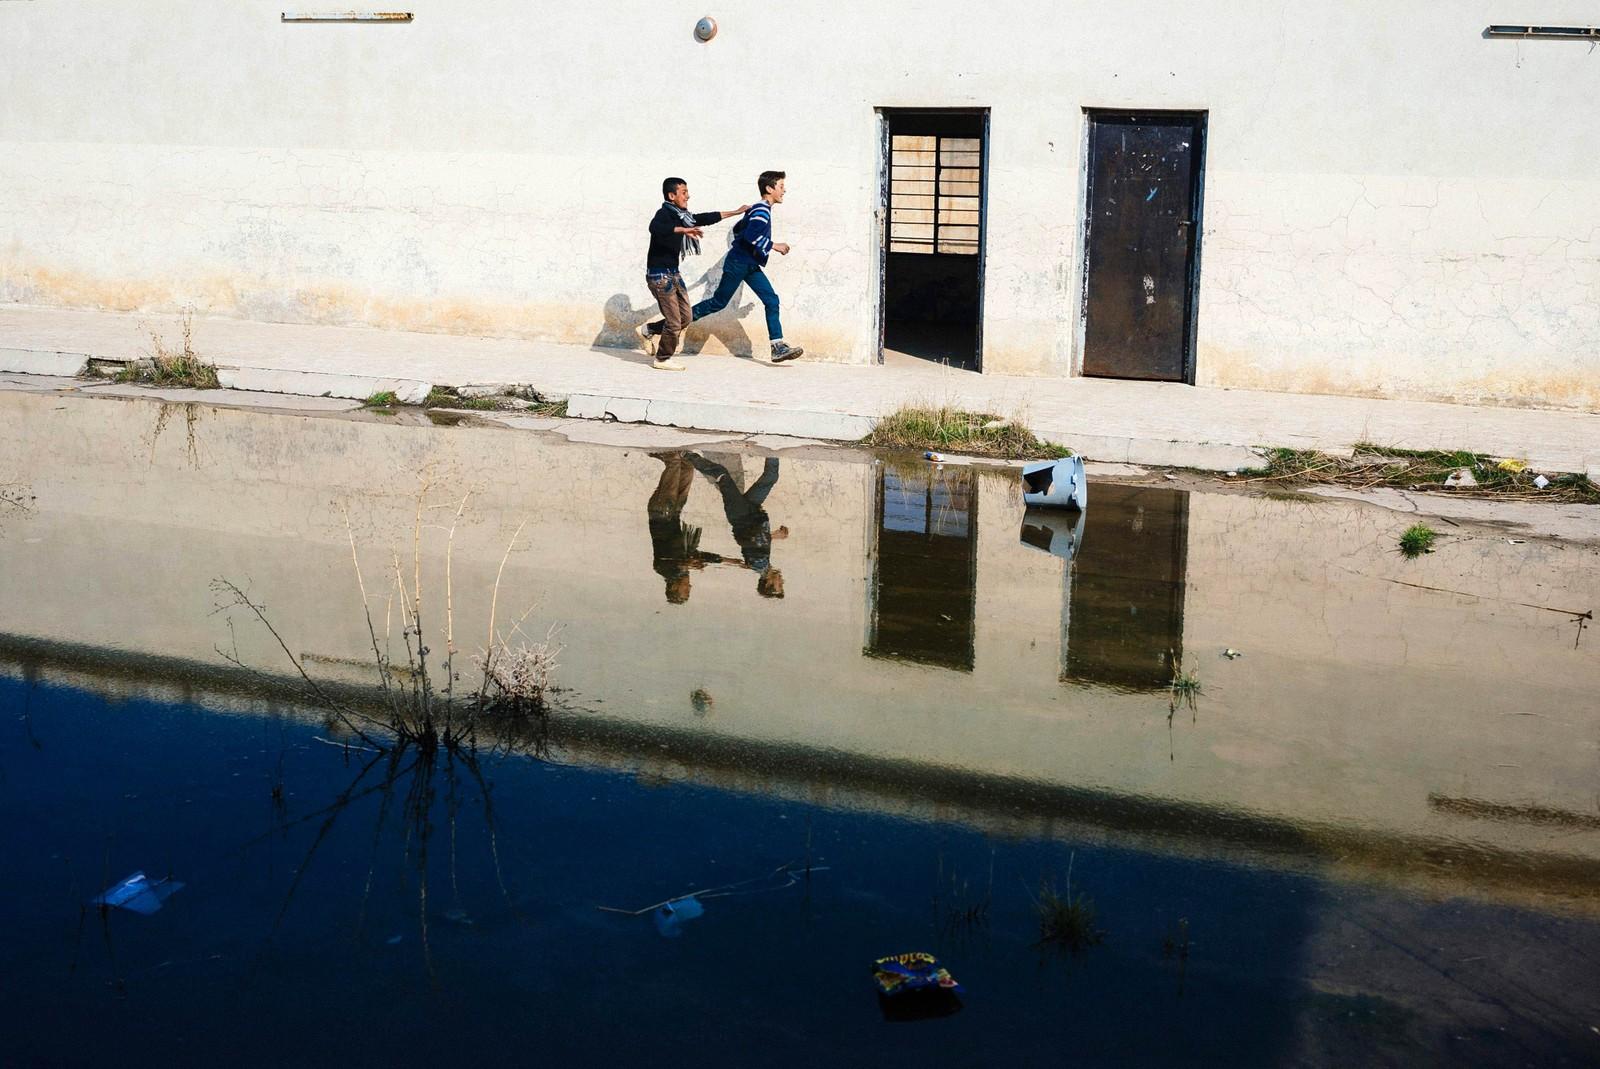 Irakiske studenter utenfor en skole i Mosul.